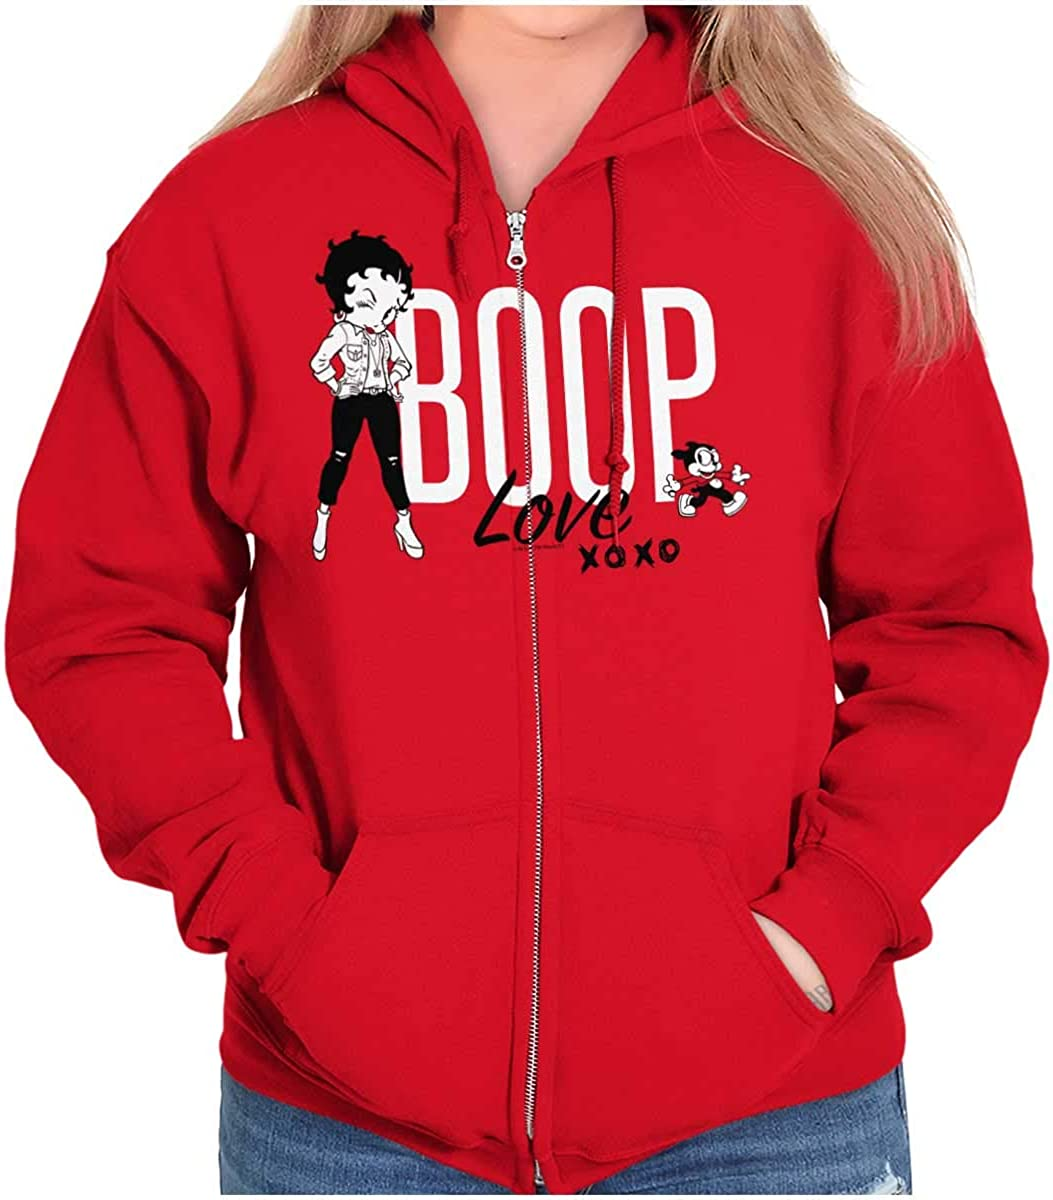 Betty Boop and Bimbo Love Hoodie Women XOXO Sales New mail order for sale Zip Sweatshirt